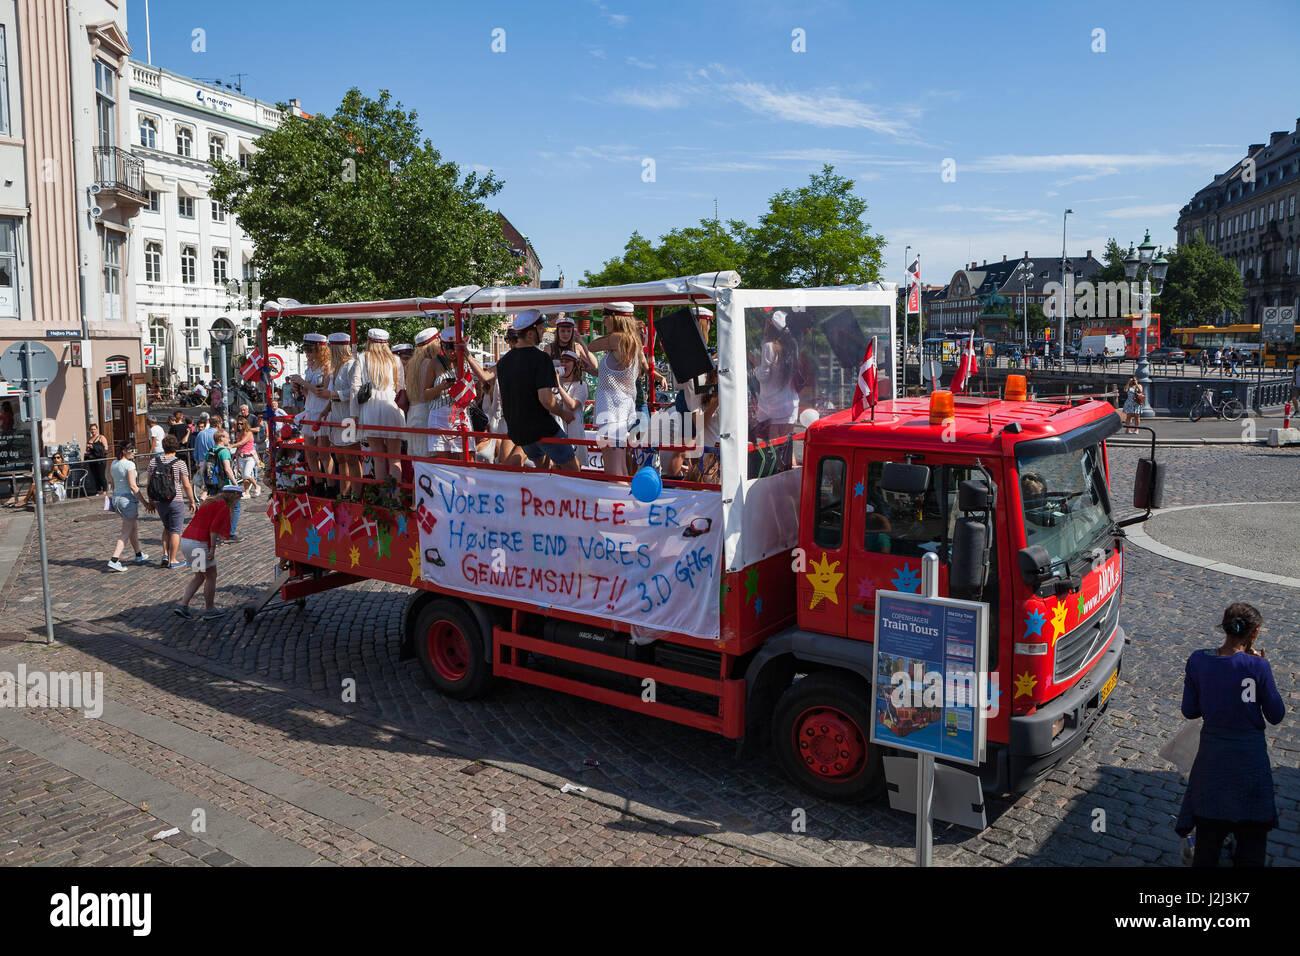 COPENHAGEN, DENMARK - 26 JUN 2016: Students celebrate their high school graduation in funny truck - Stock Image